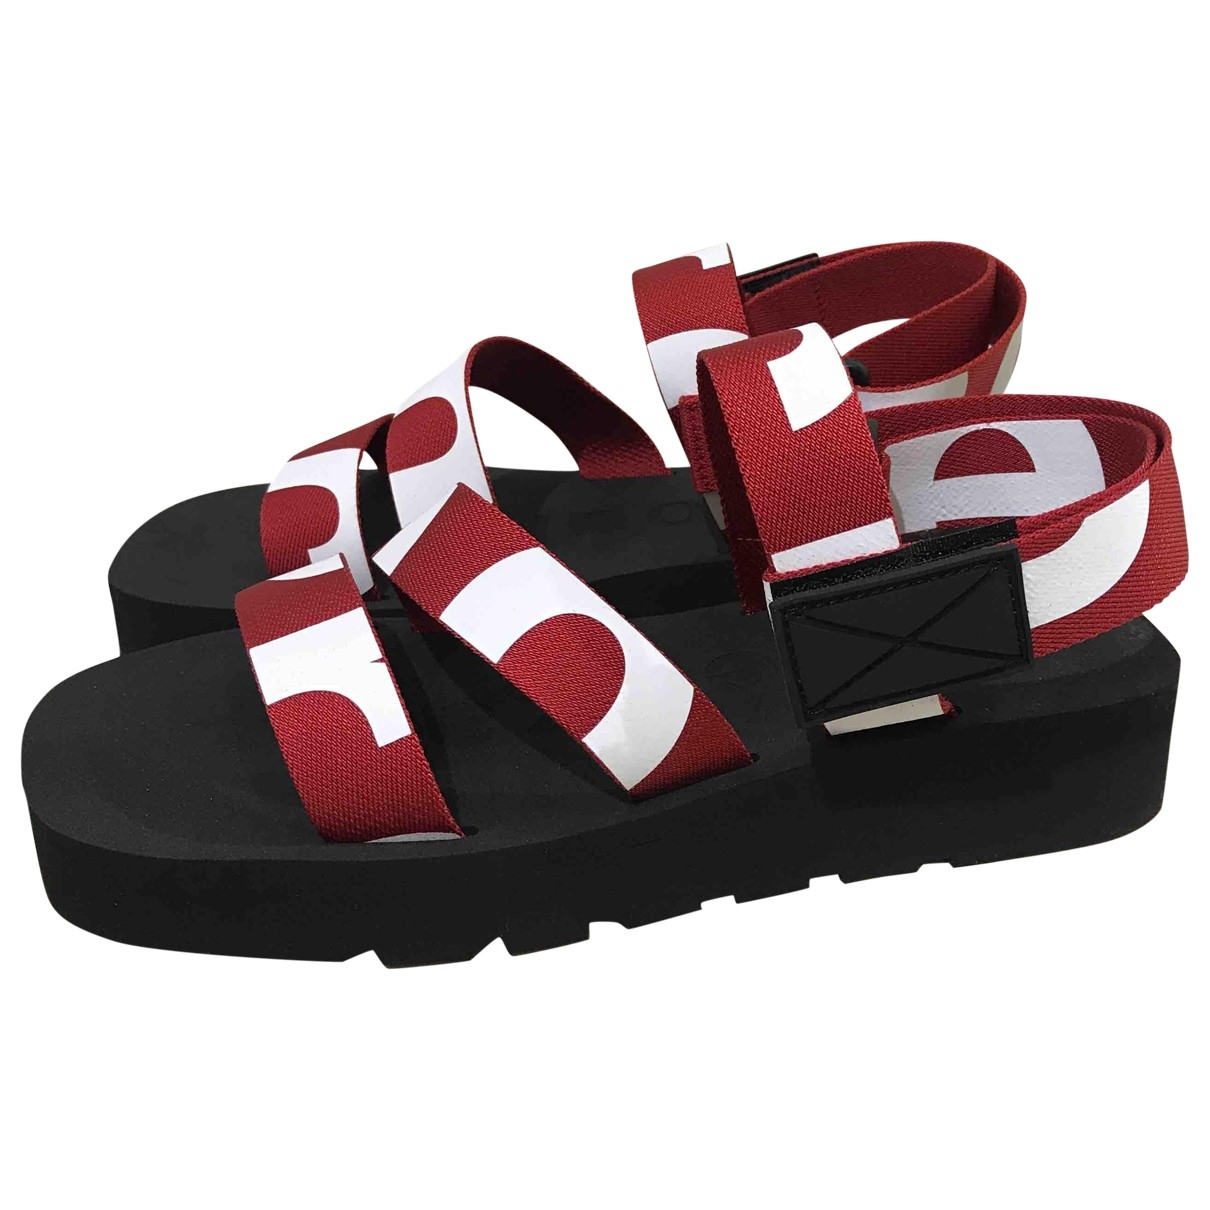 Proenza Schouler \N Sandalen in  Rot Polyester